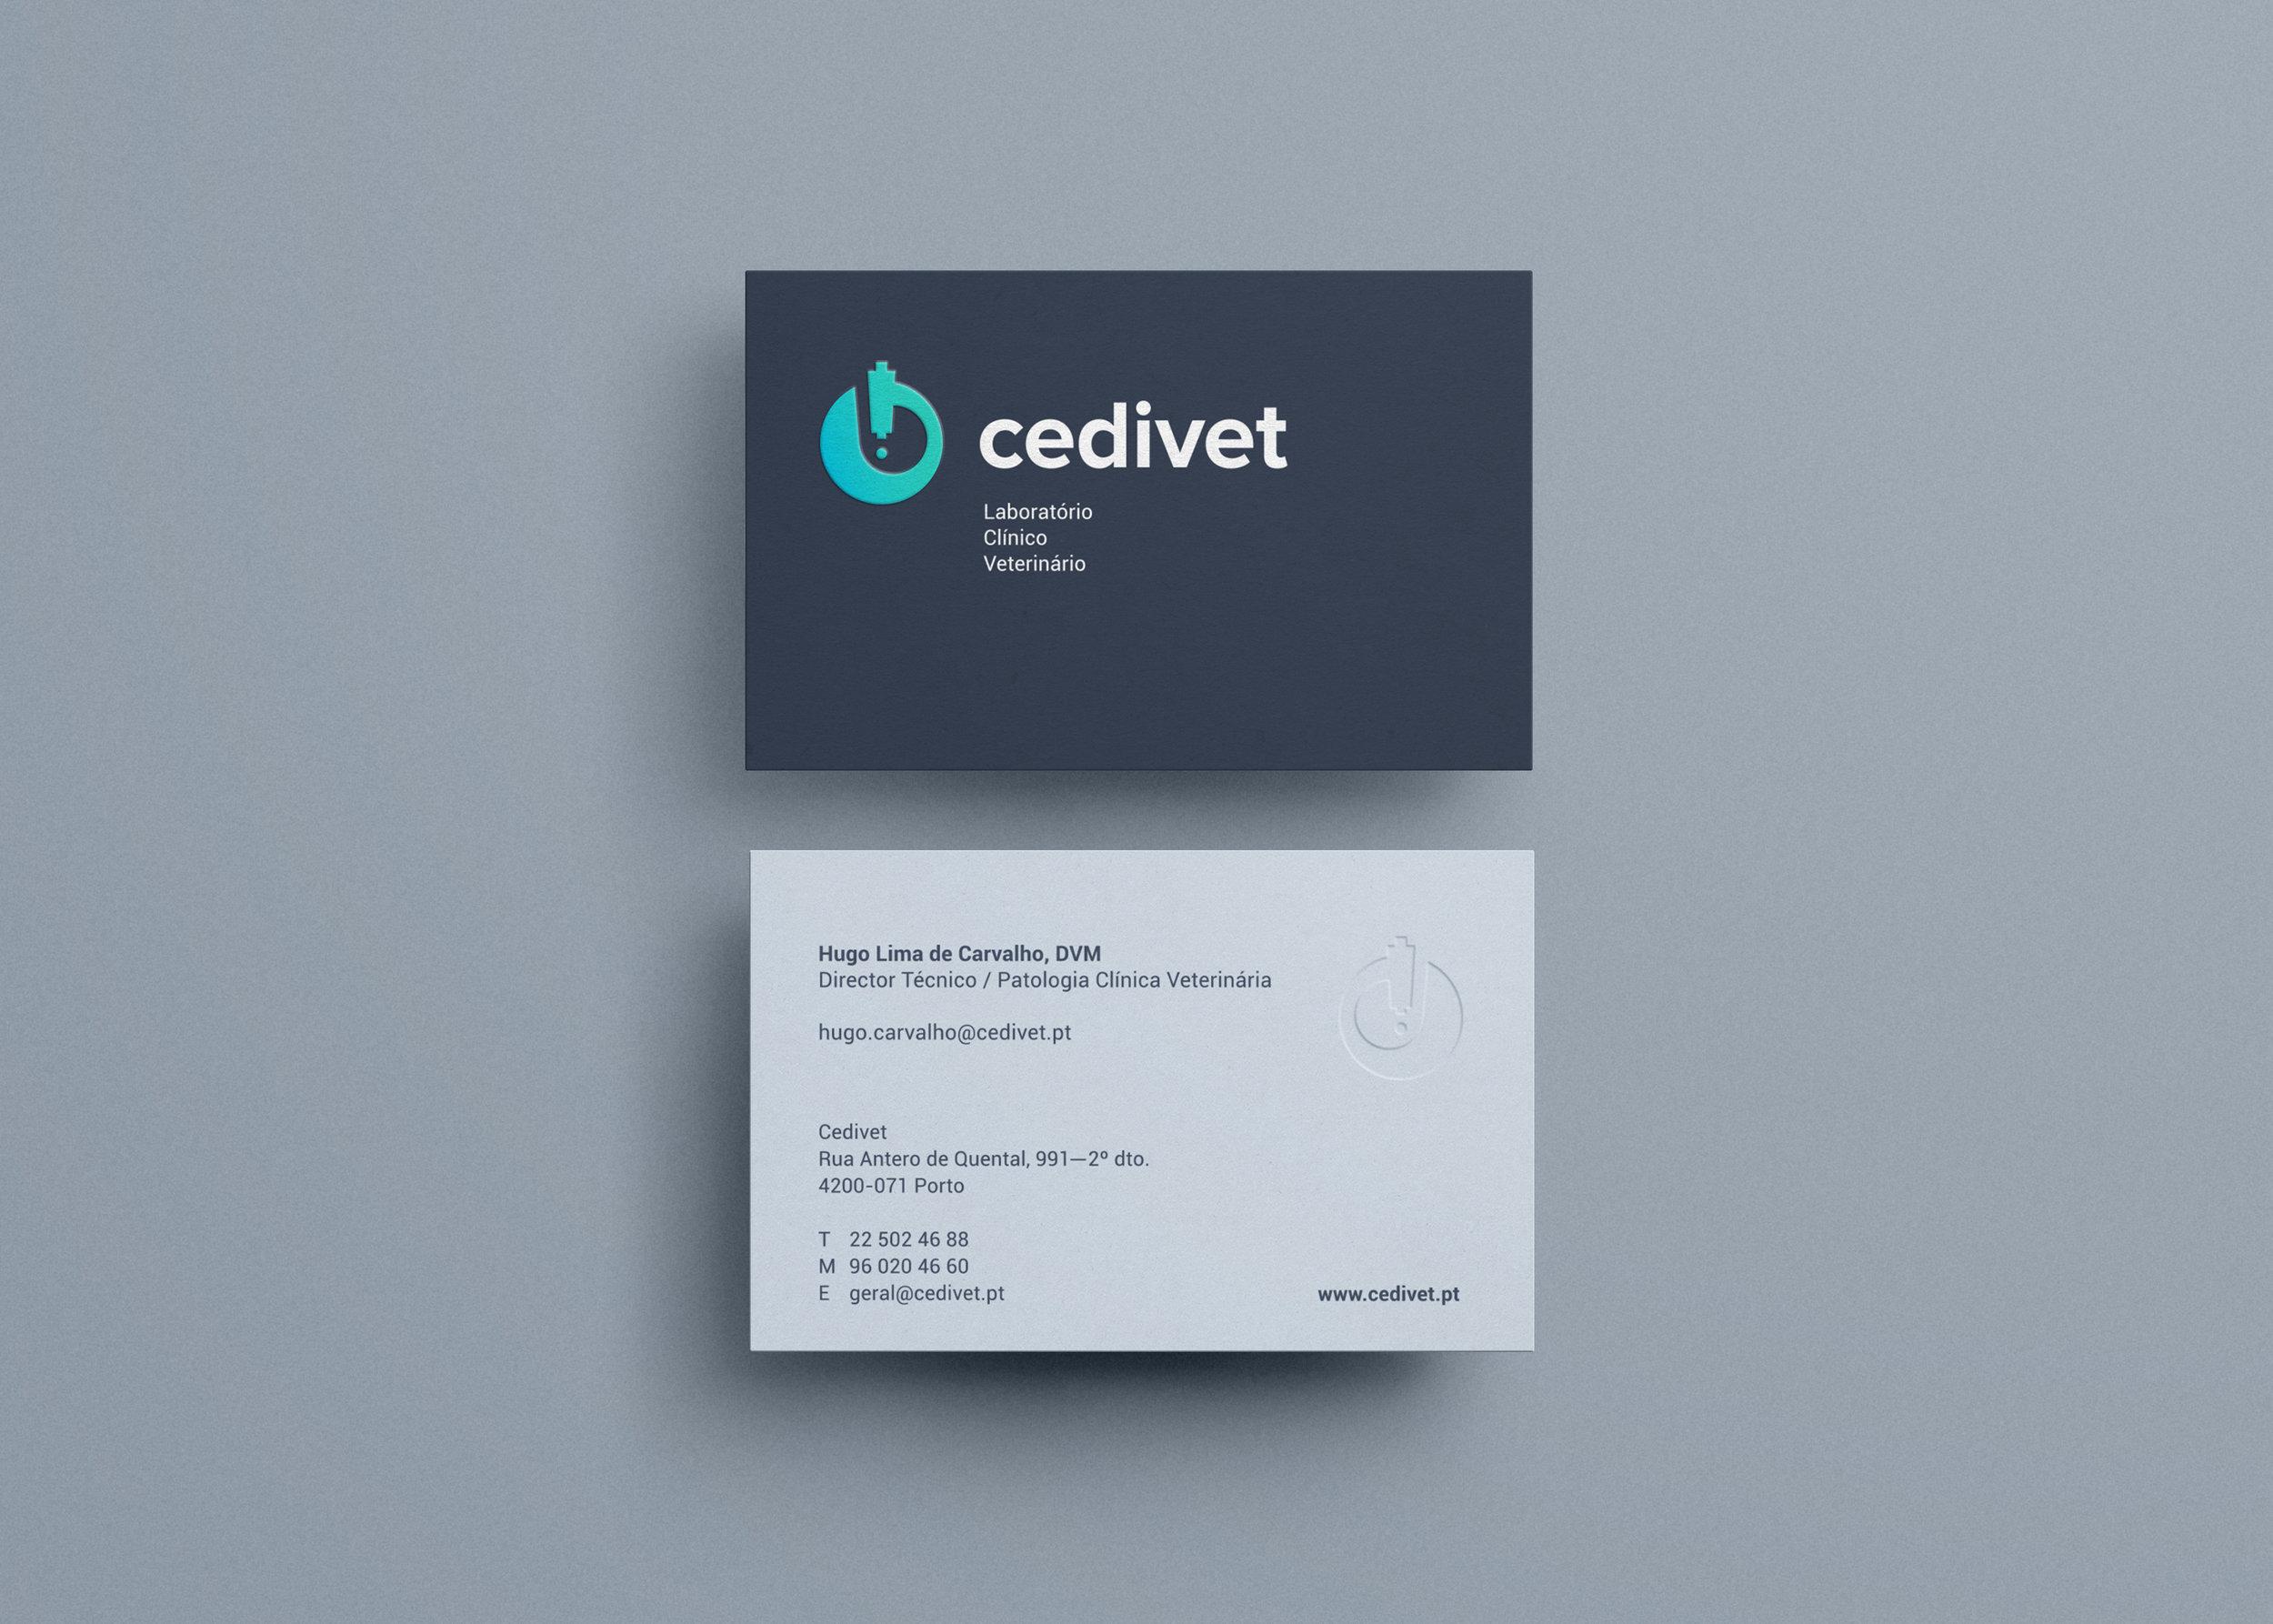 Cedivet+Veterinary+Lab+business+cards+by+Gen+design+studio.jpg